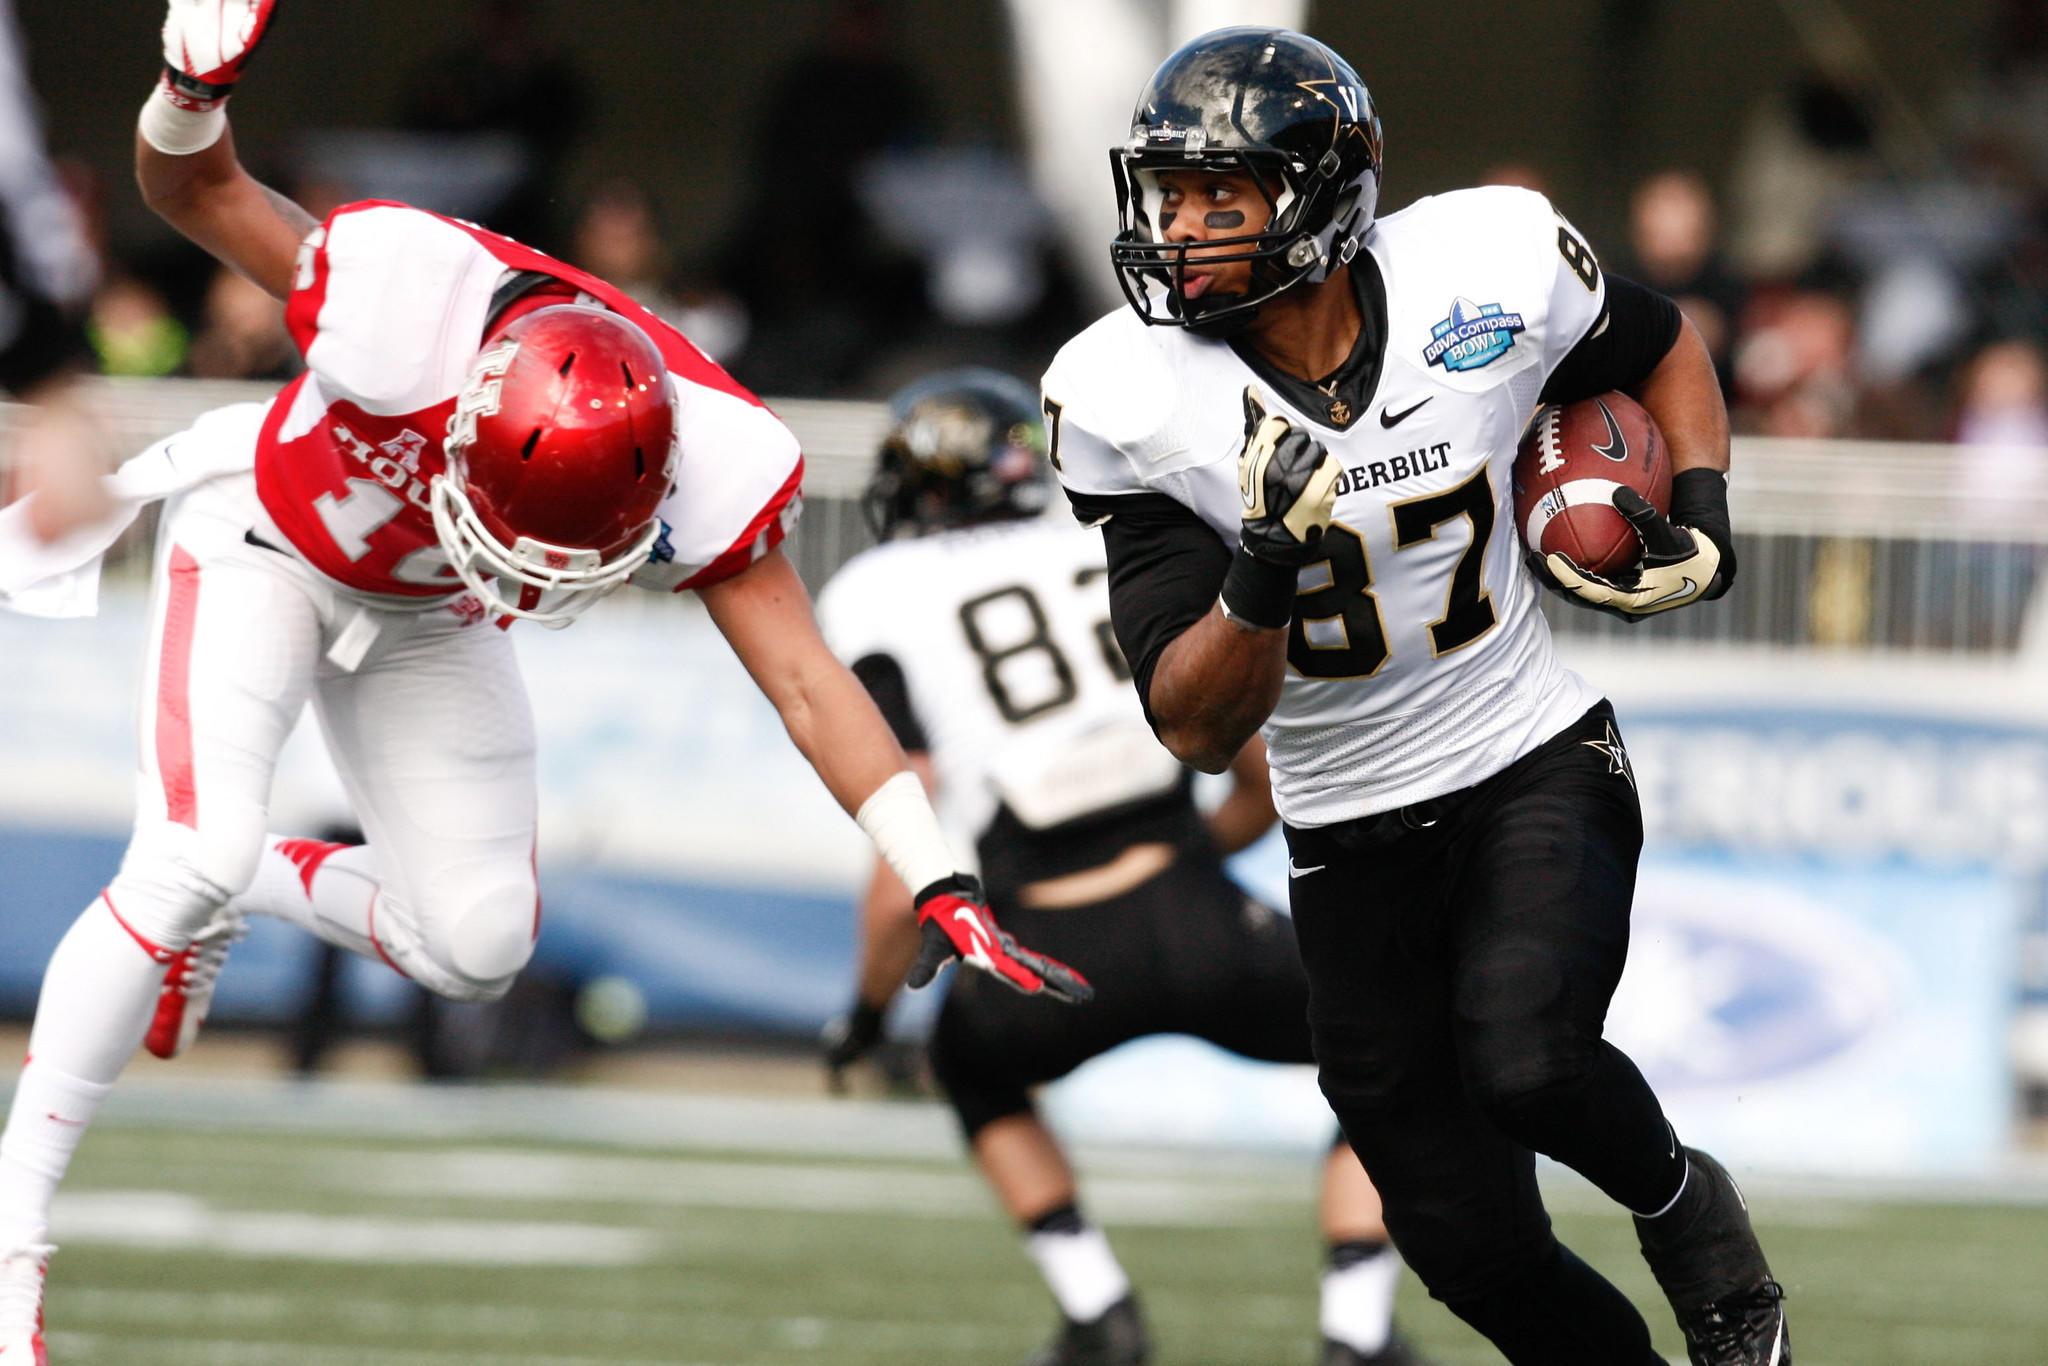 Vanderbilt wide receiver Jordan Matthews sprints toward a touchdown in the 2014 Compass Bowl against Houston.